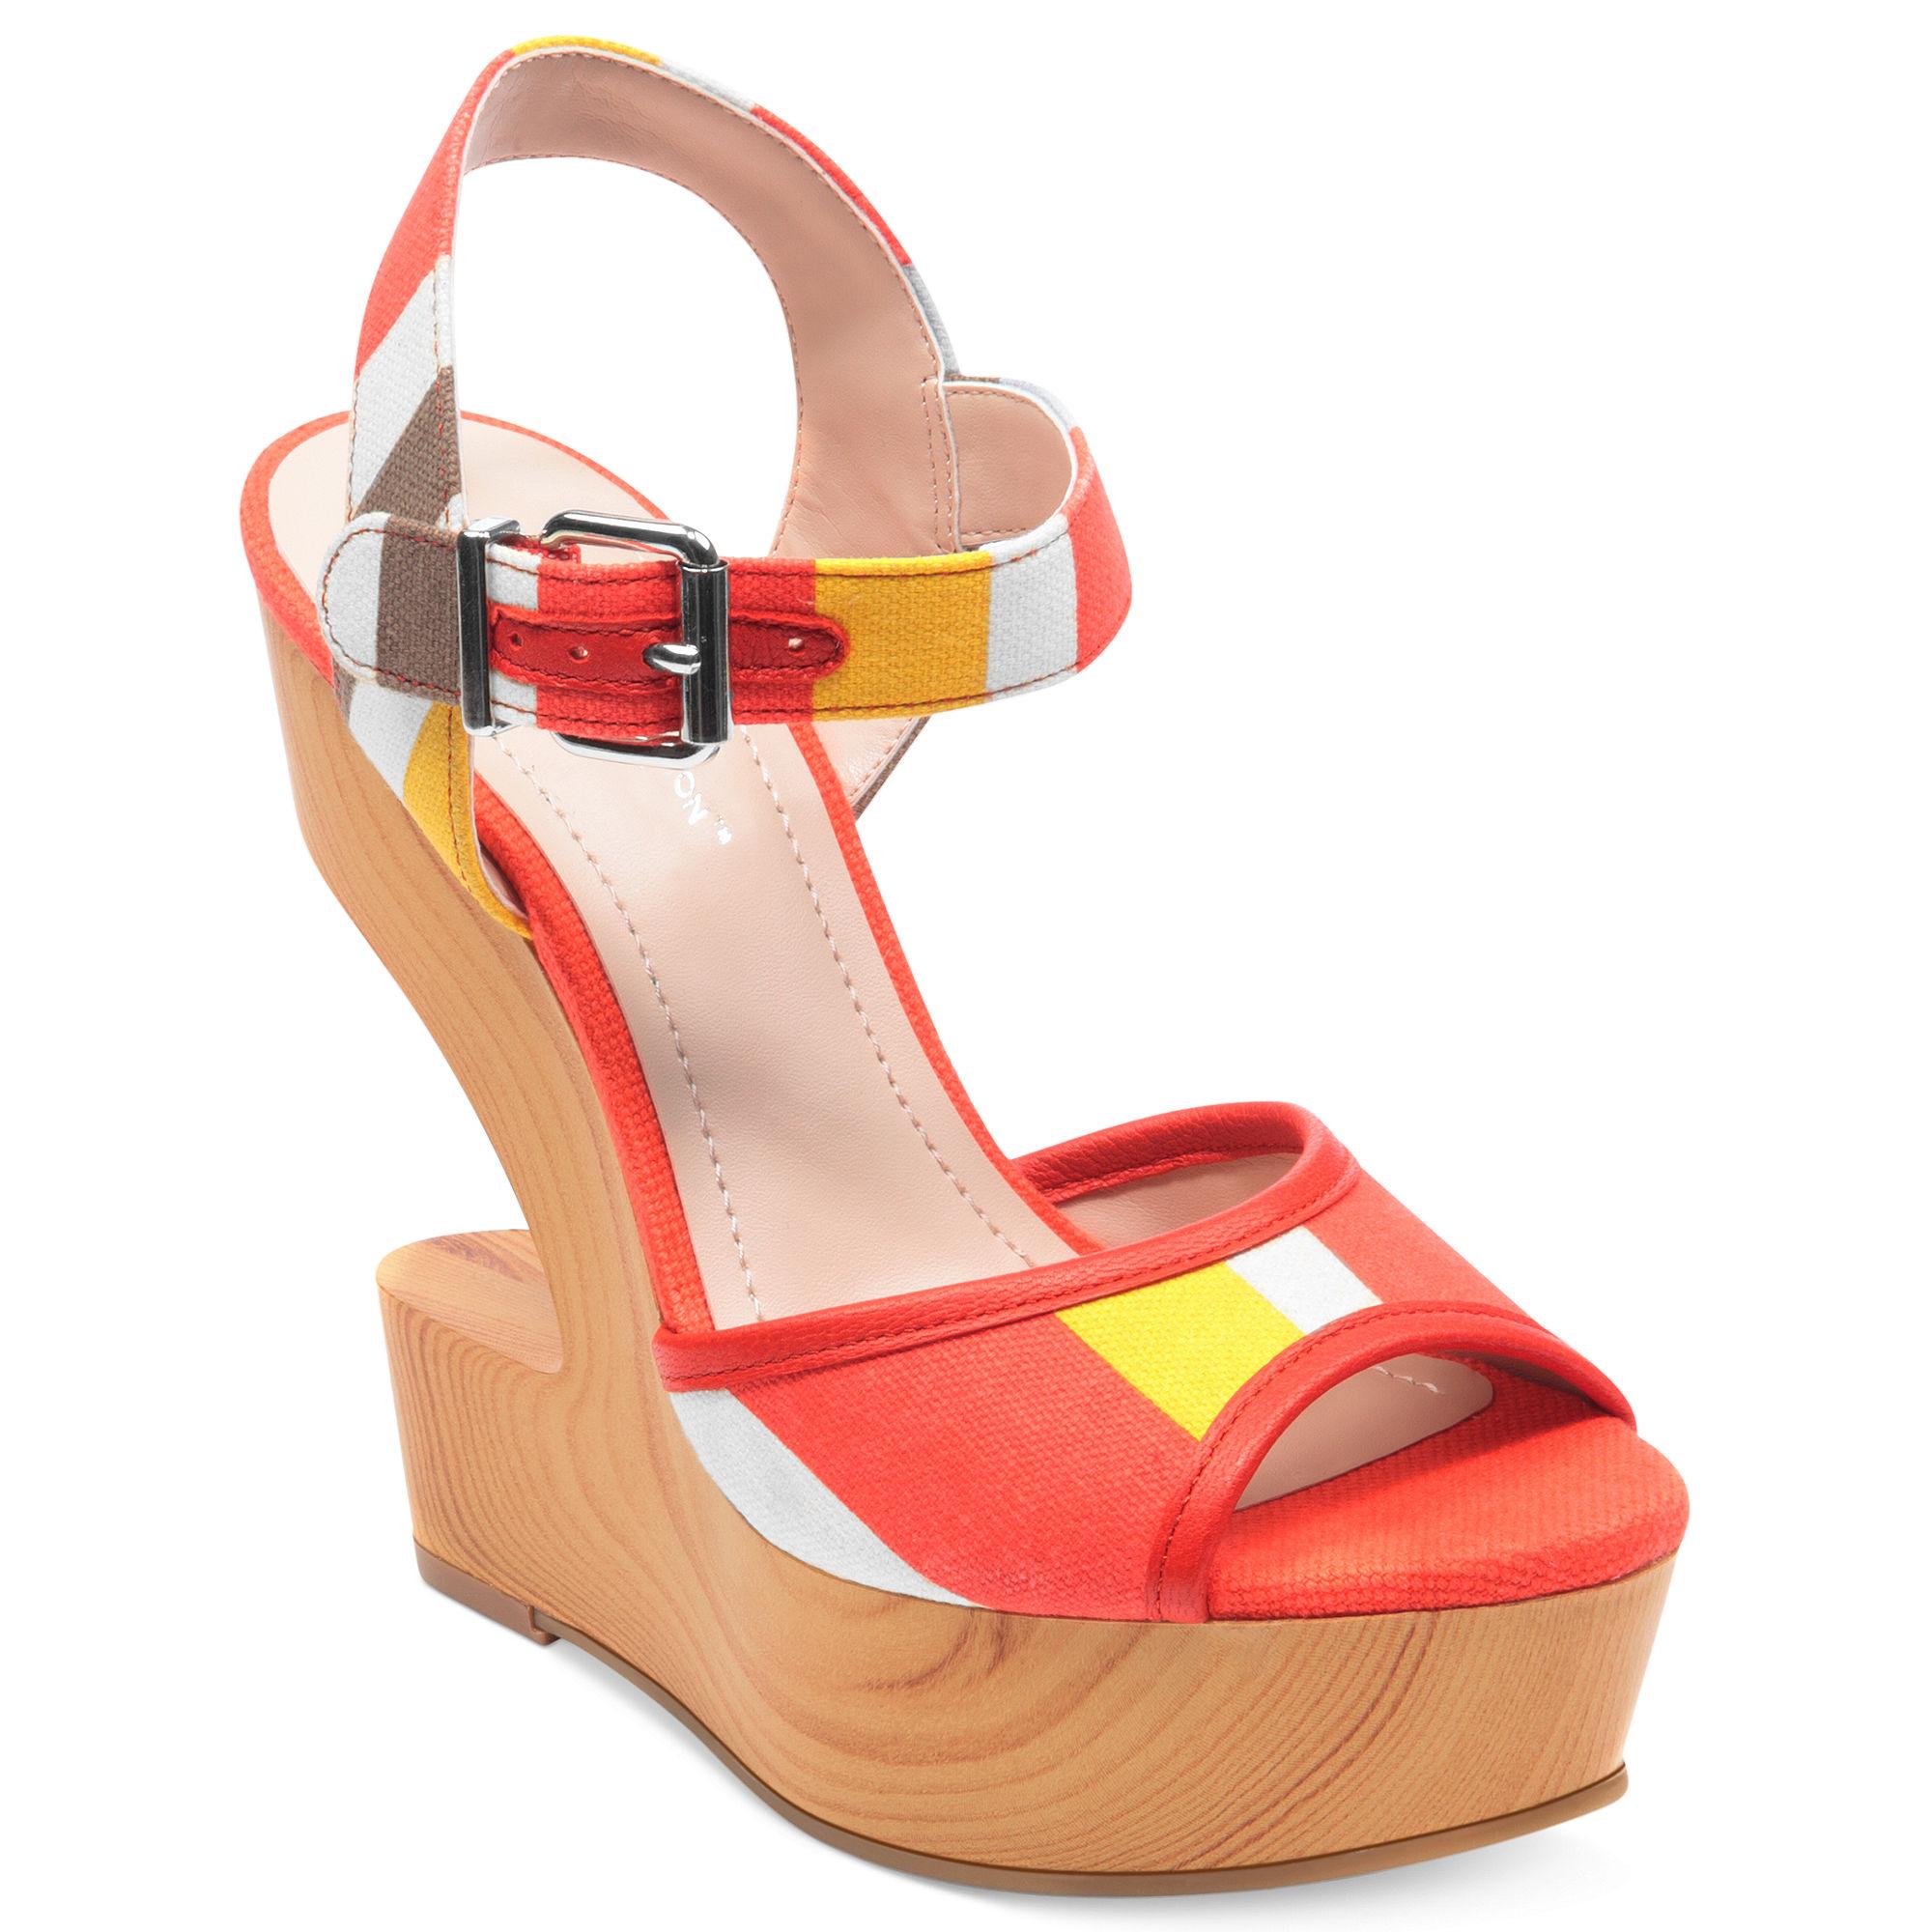 10 Super Stylish Sandals for Women